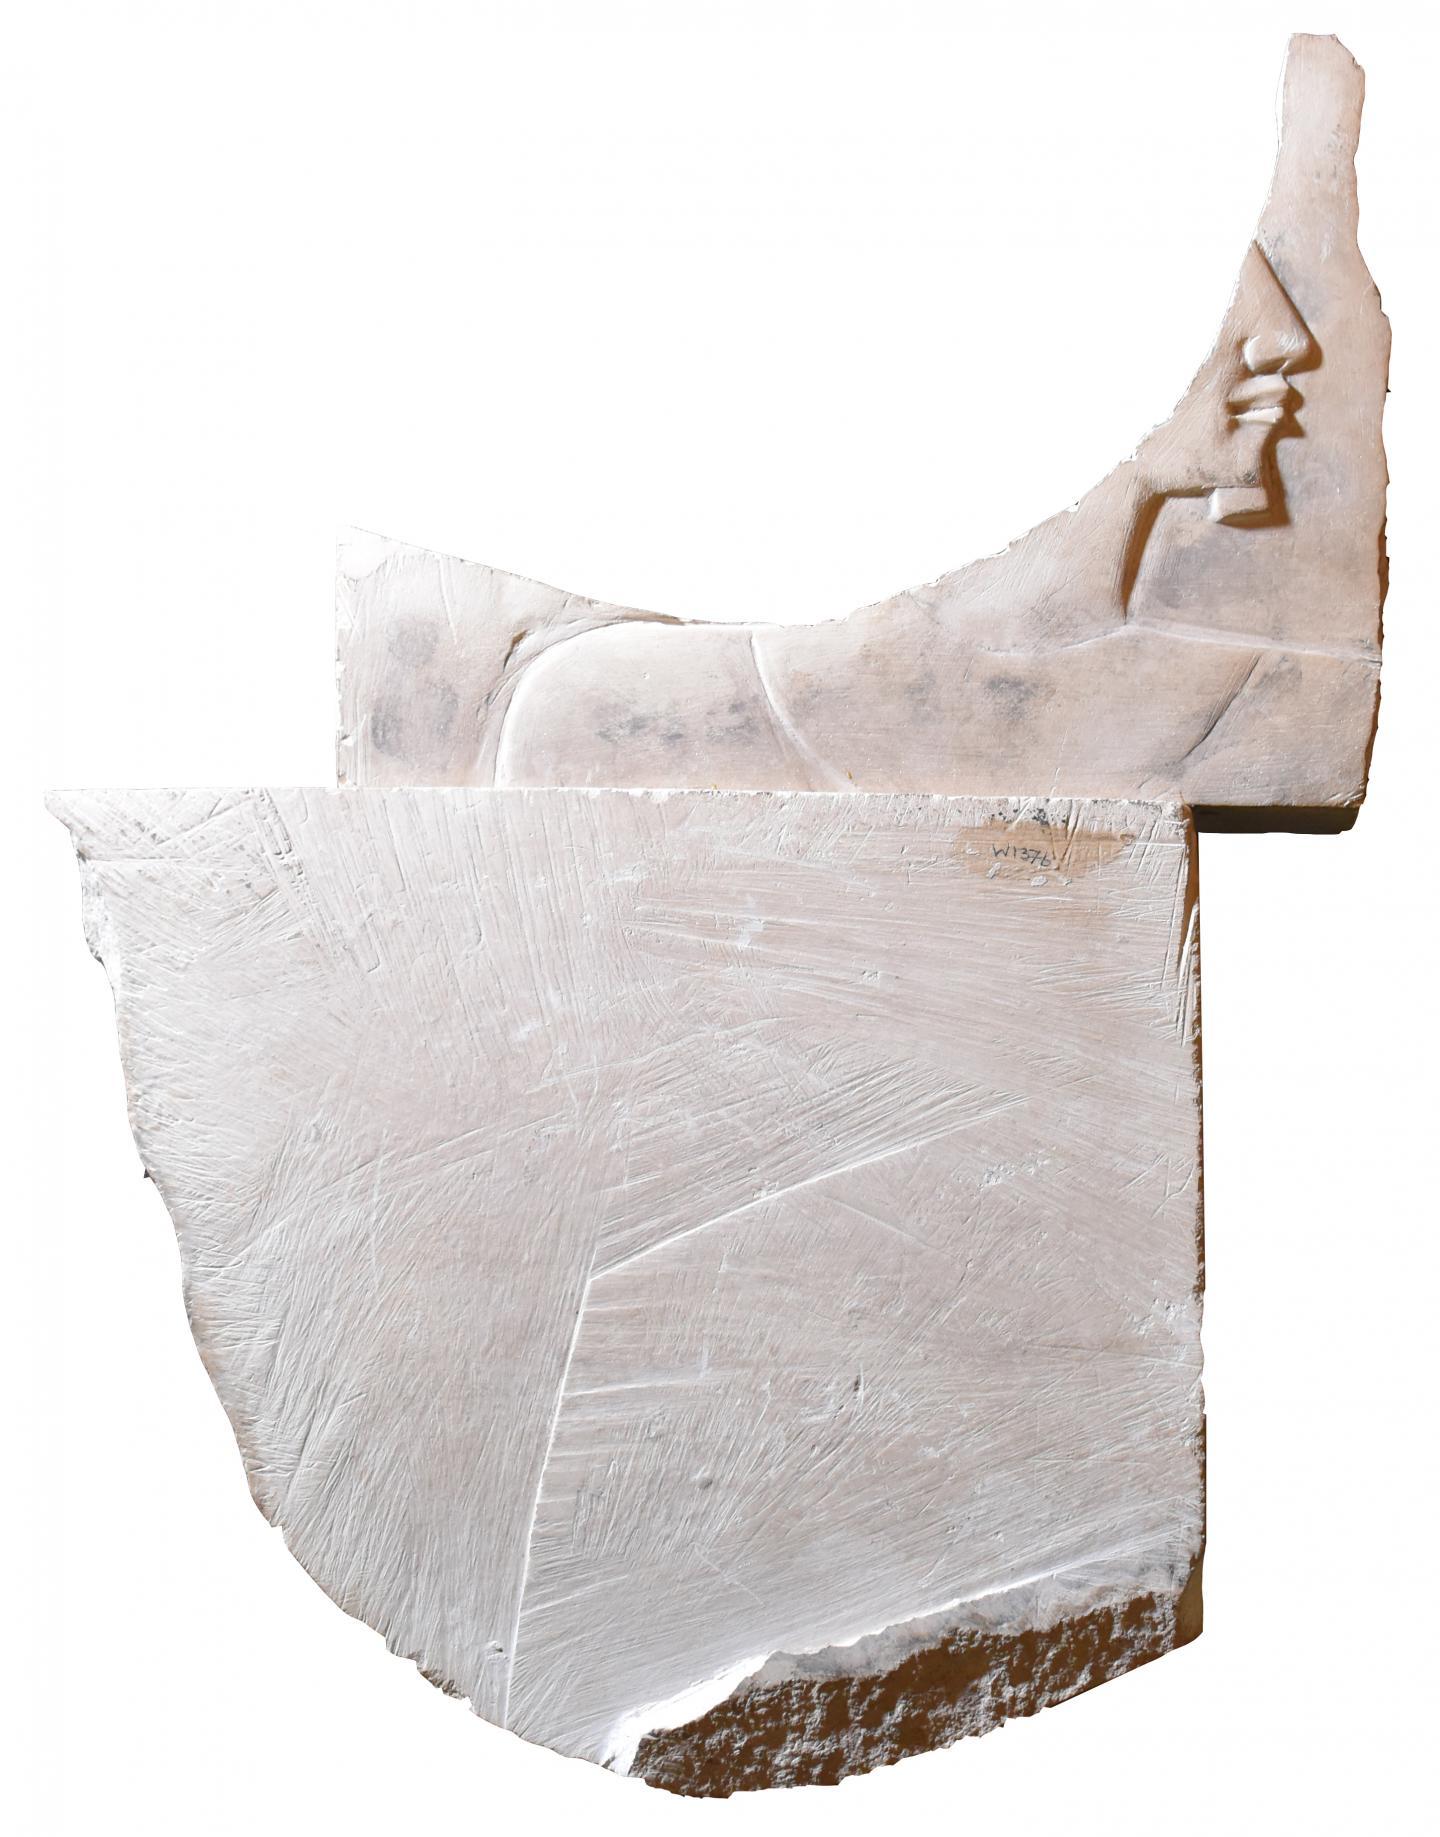 Head of Pharaoh Discovery (2 of 2)